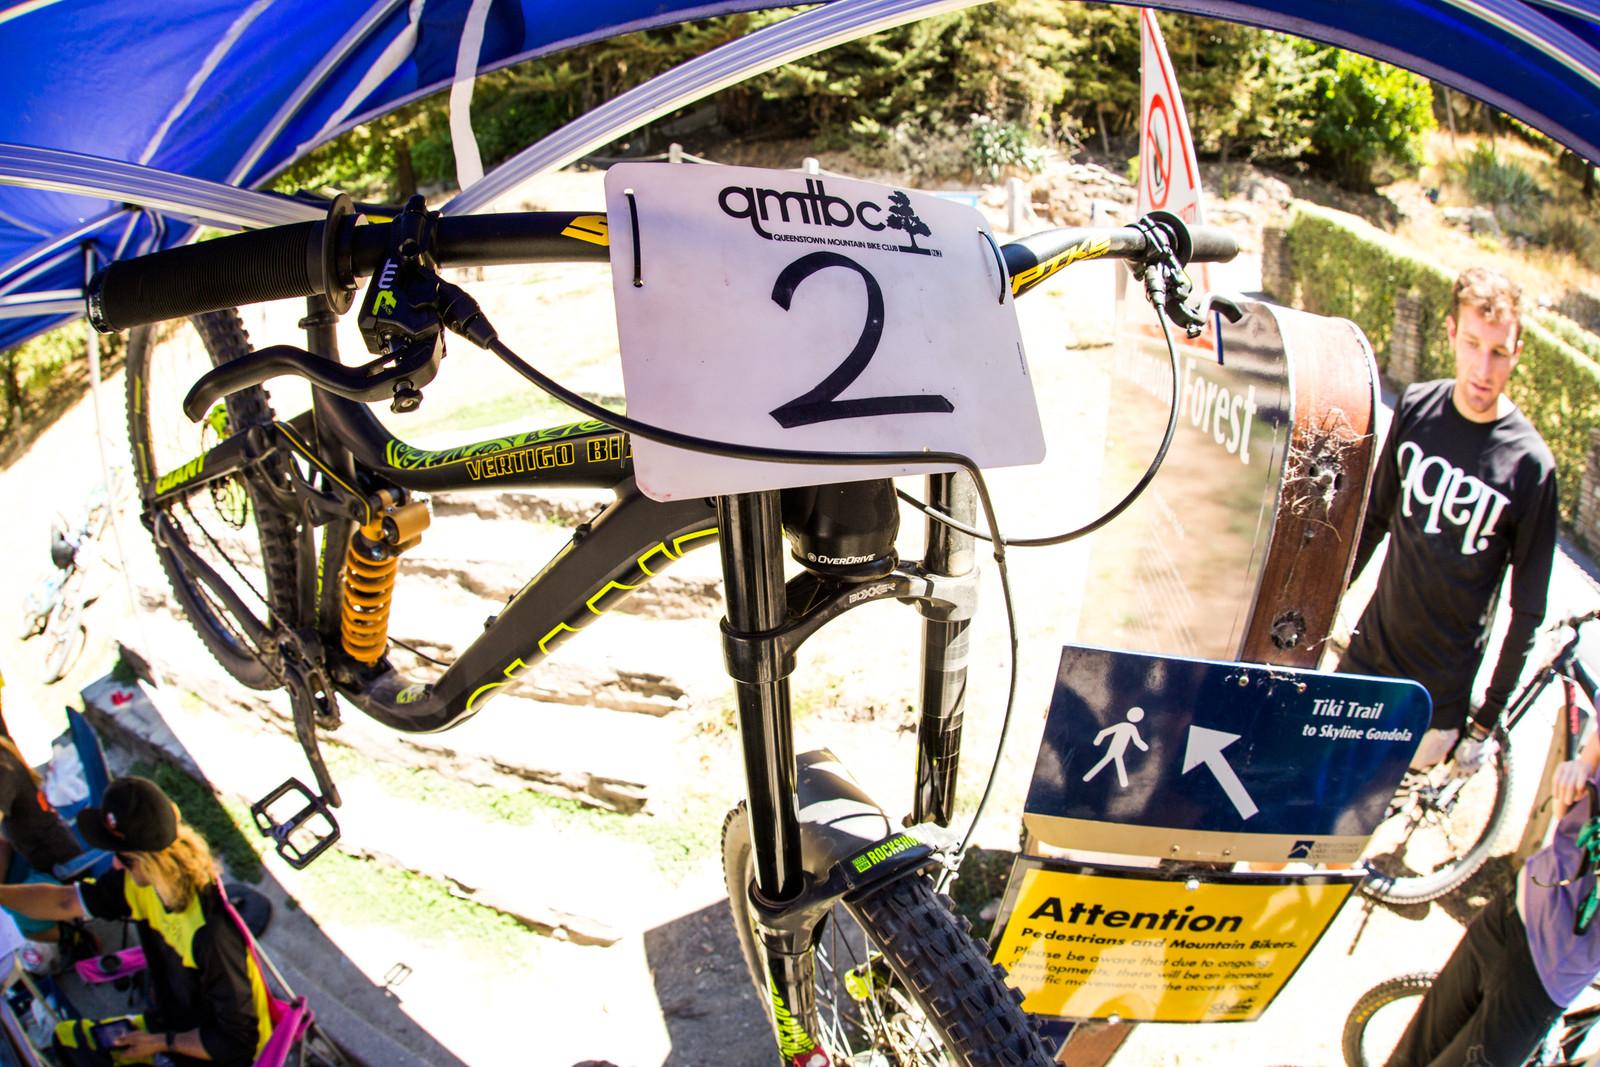 Pang Gets to Race! - Homegrown NZ Downhill - Vertigo Bikes Ride More DH Series Race 1 - Mountain Biking Pictures - Vital MTB